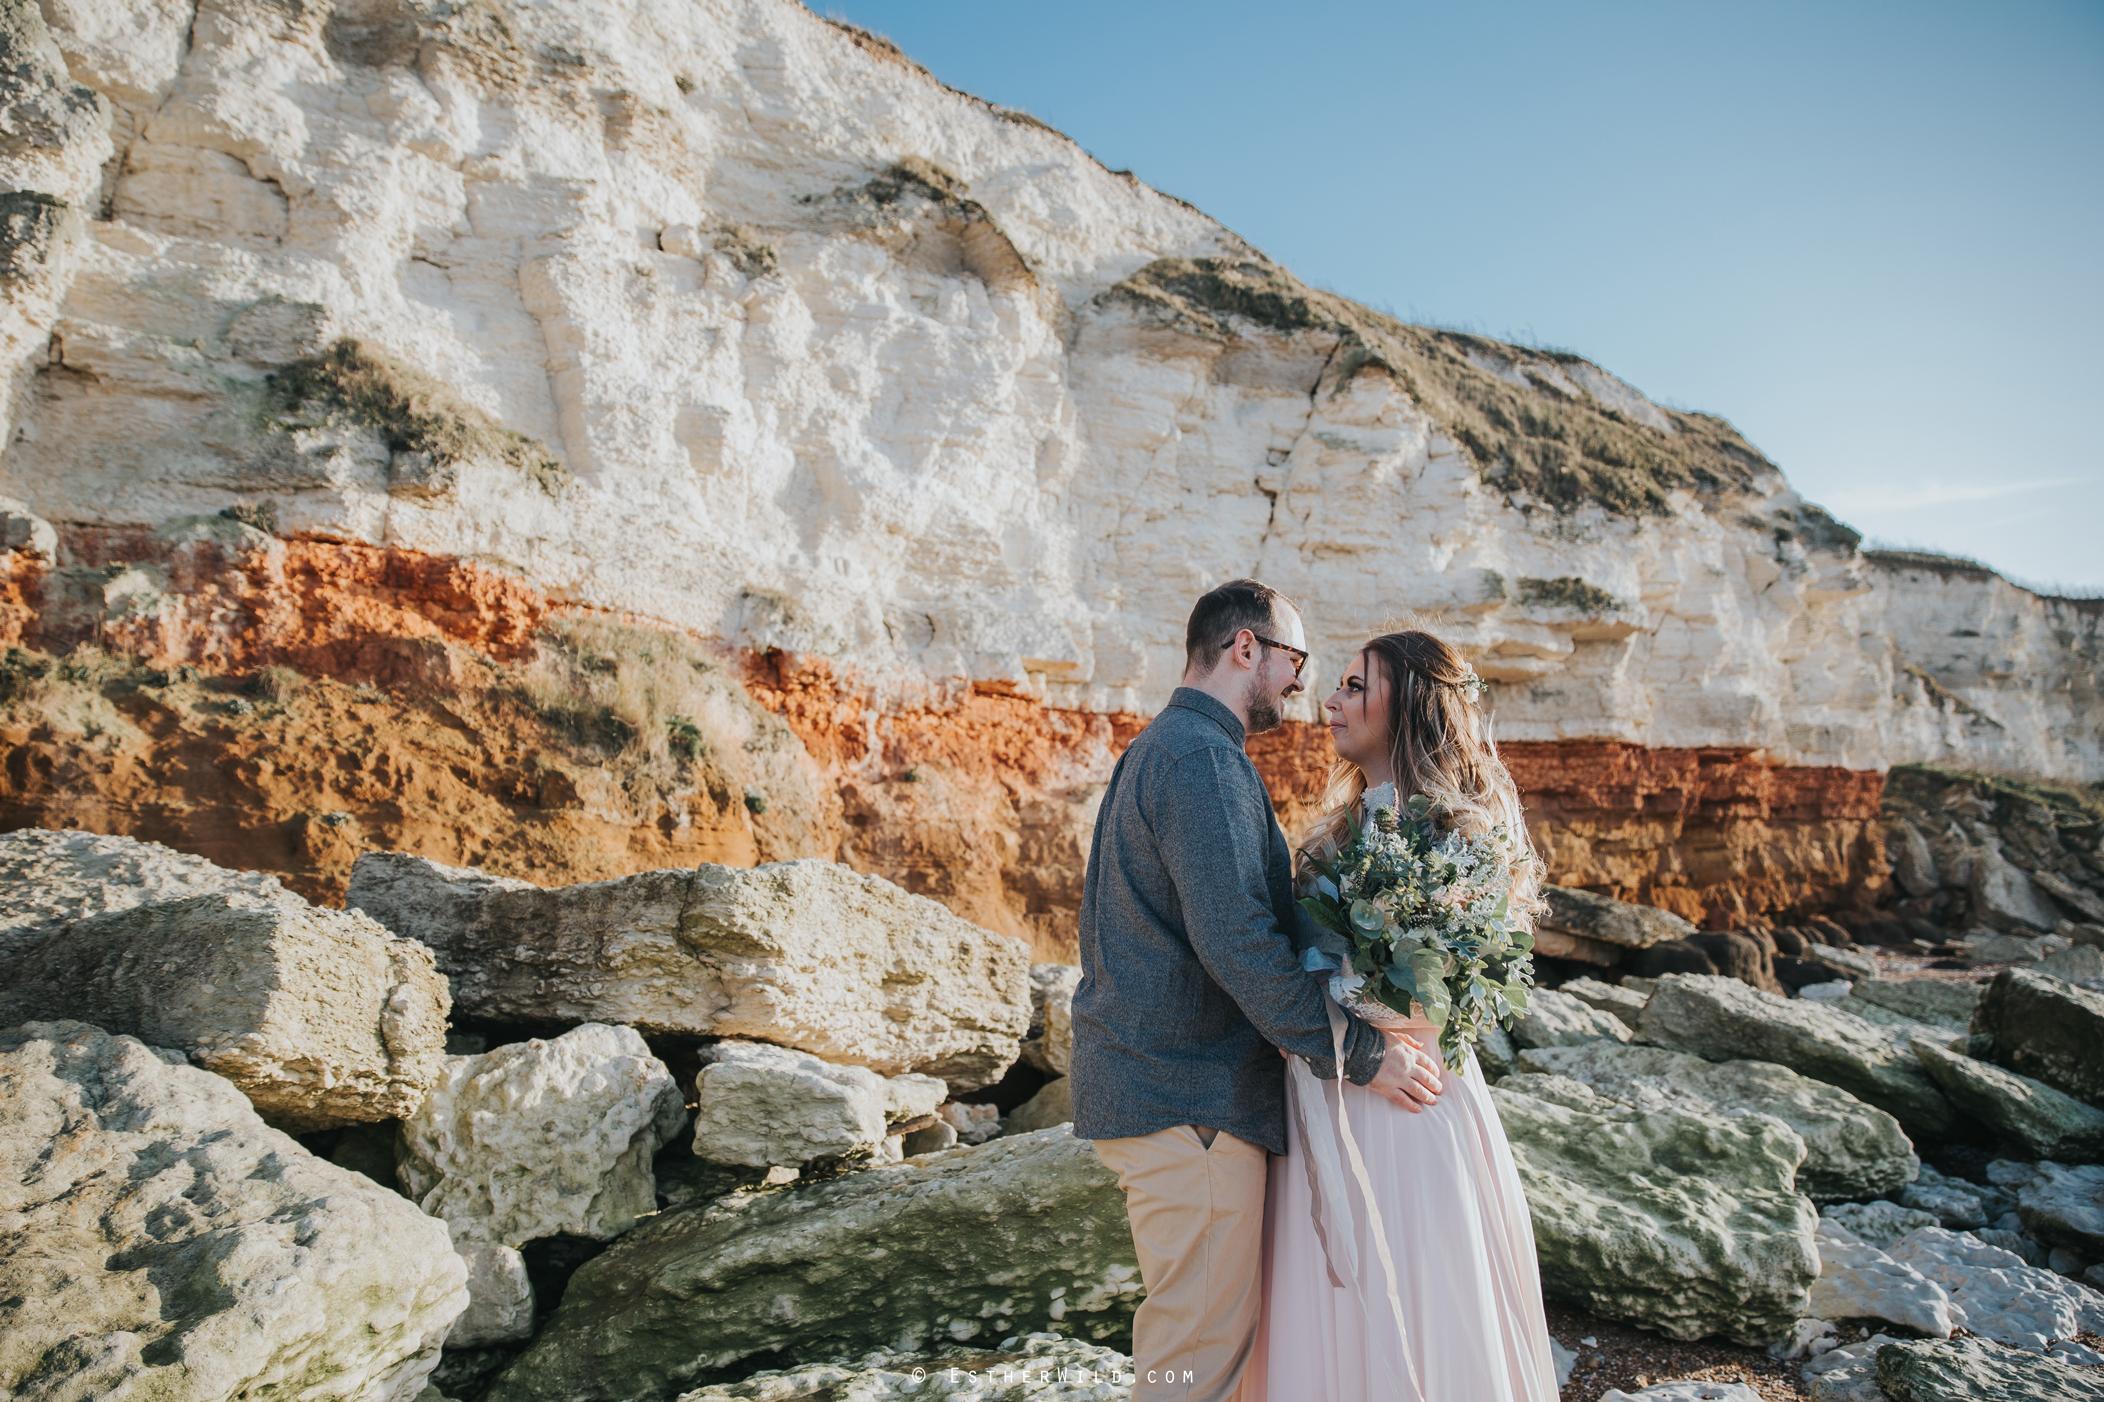 Couple_Anniversary_Wedding_Photography_Hunstanton_Norfolk_Esther_Wild_Share_Copy_IMG_8798.jpg